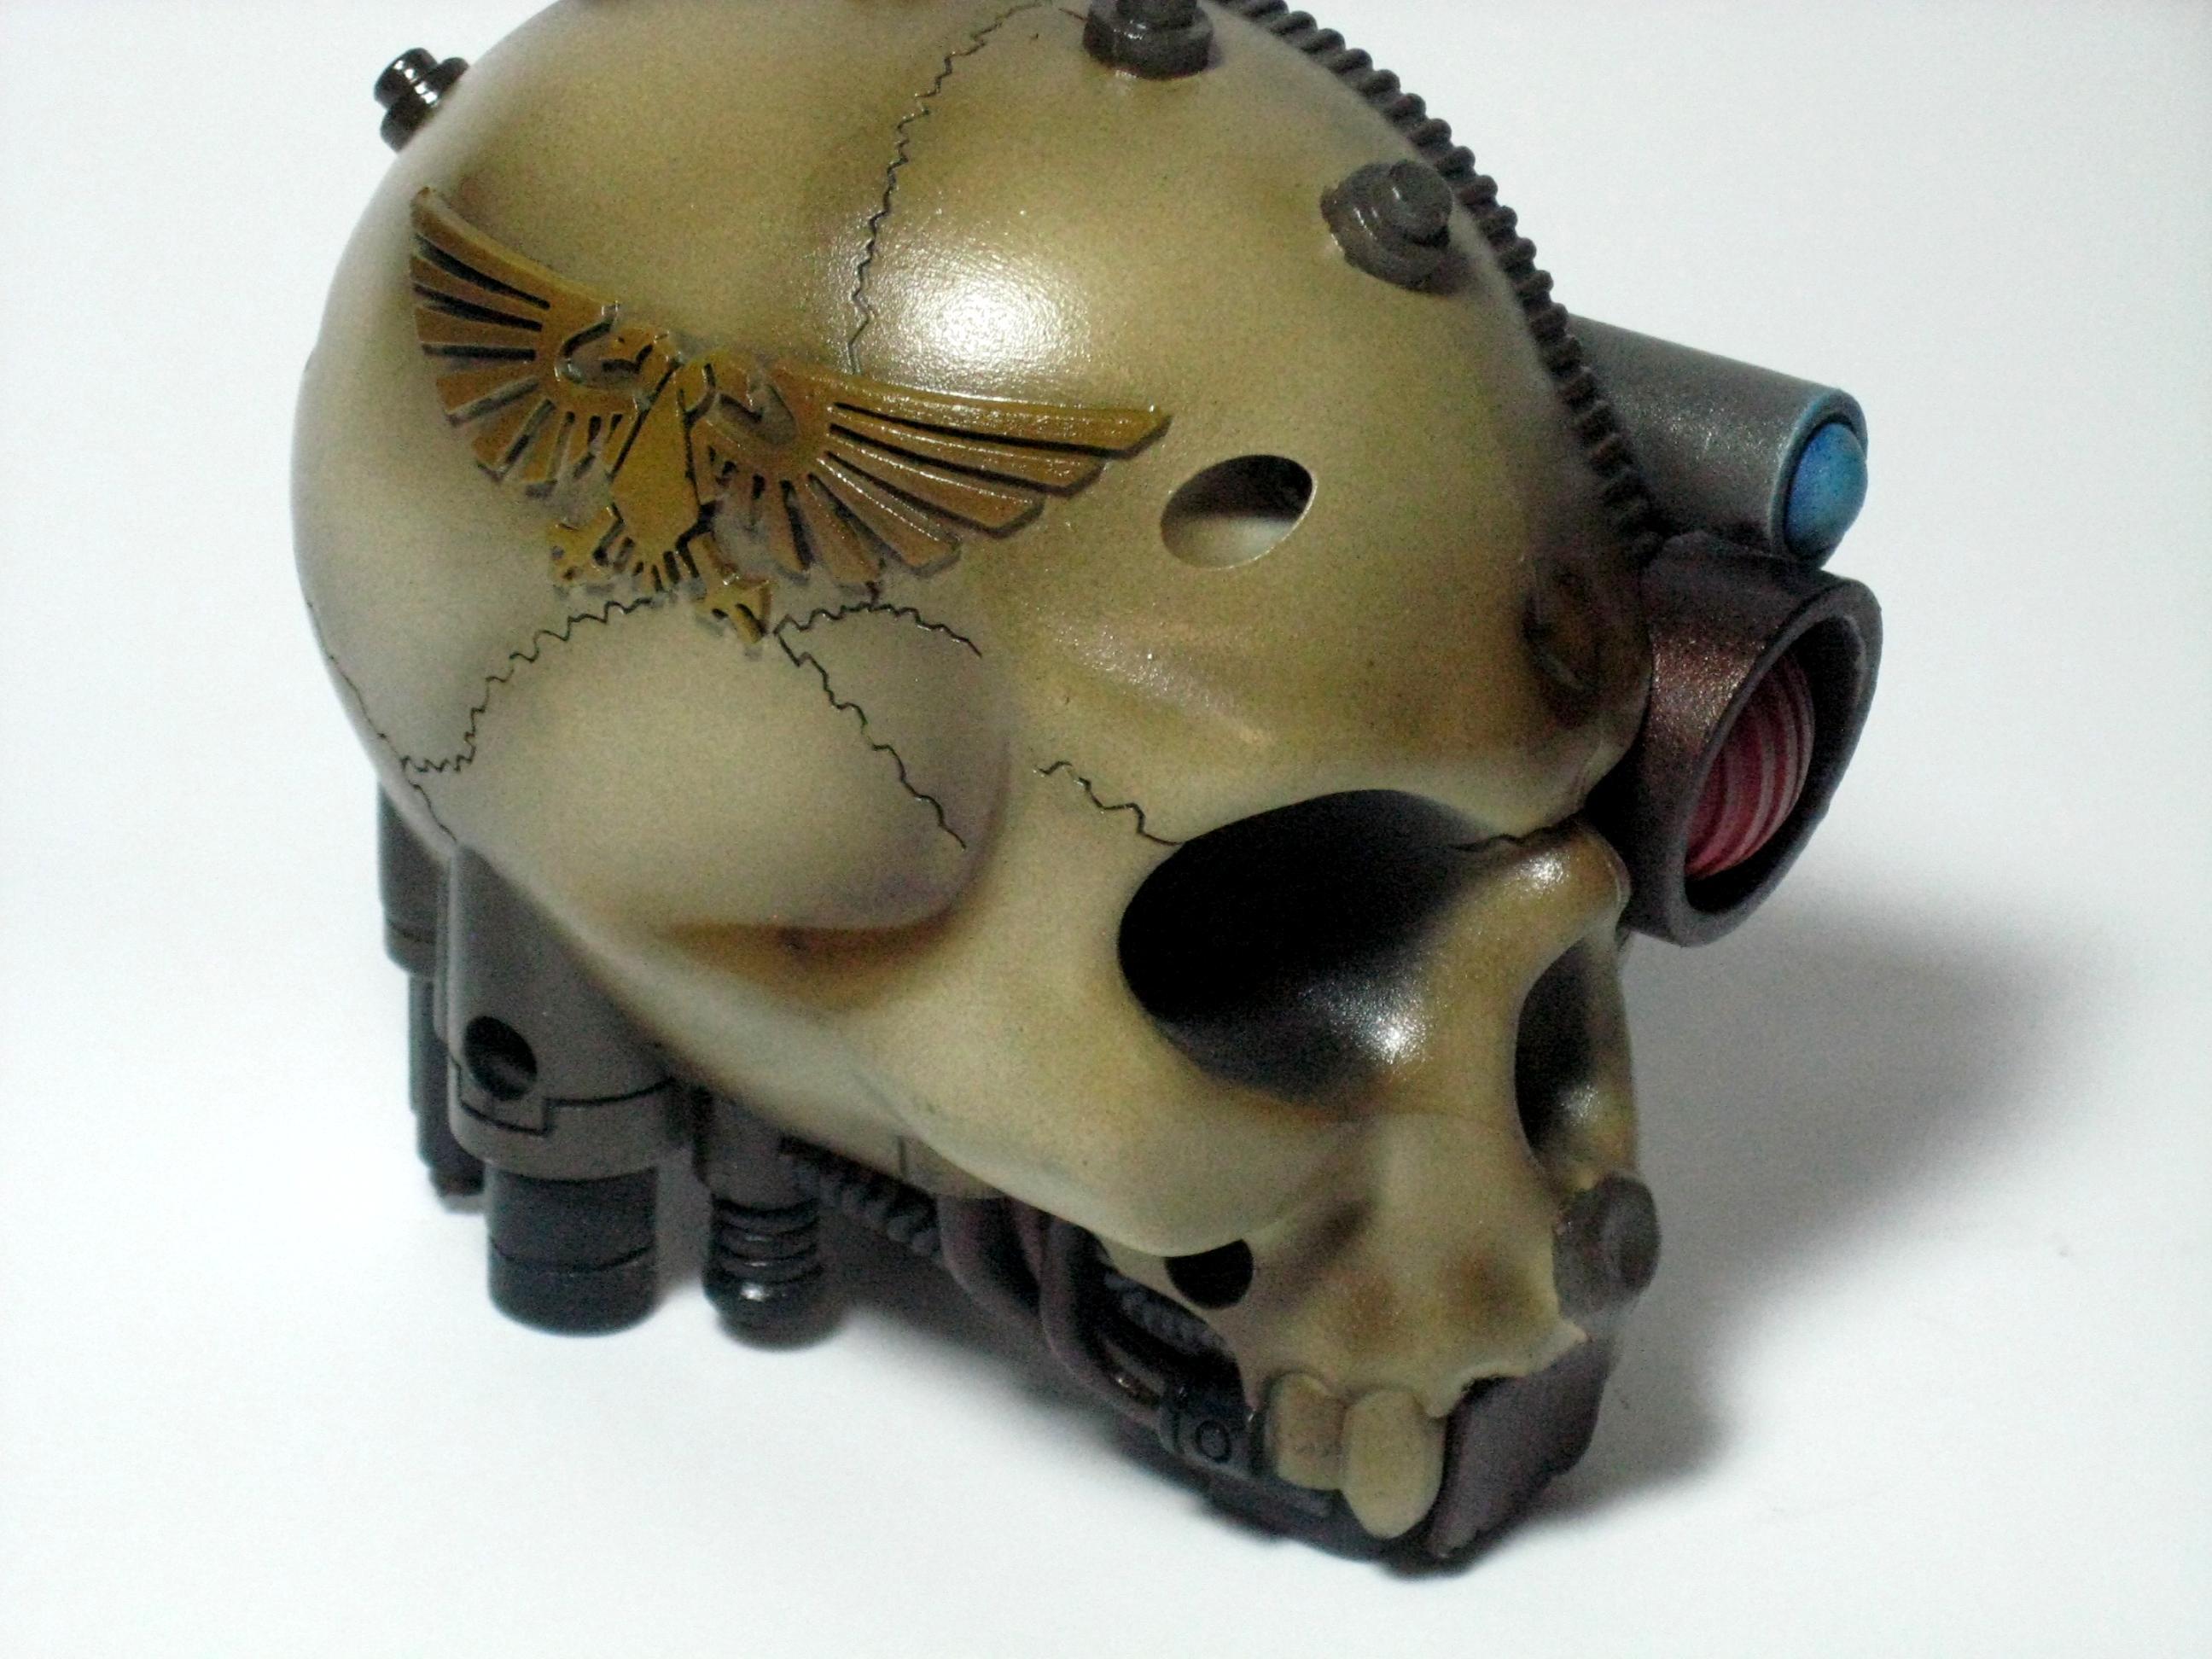 Airbrush, Cool, Imperial Guard, Measure, Servo Skull, Skull, Tape